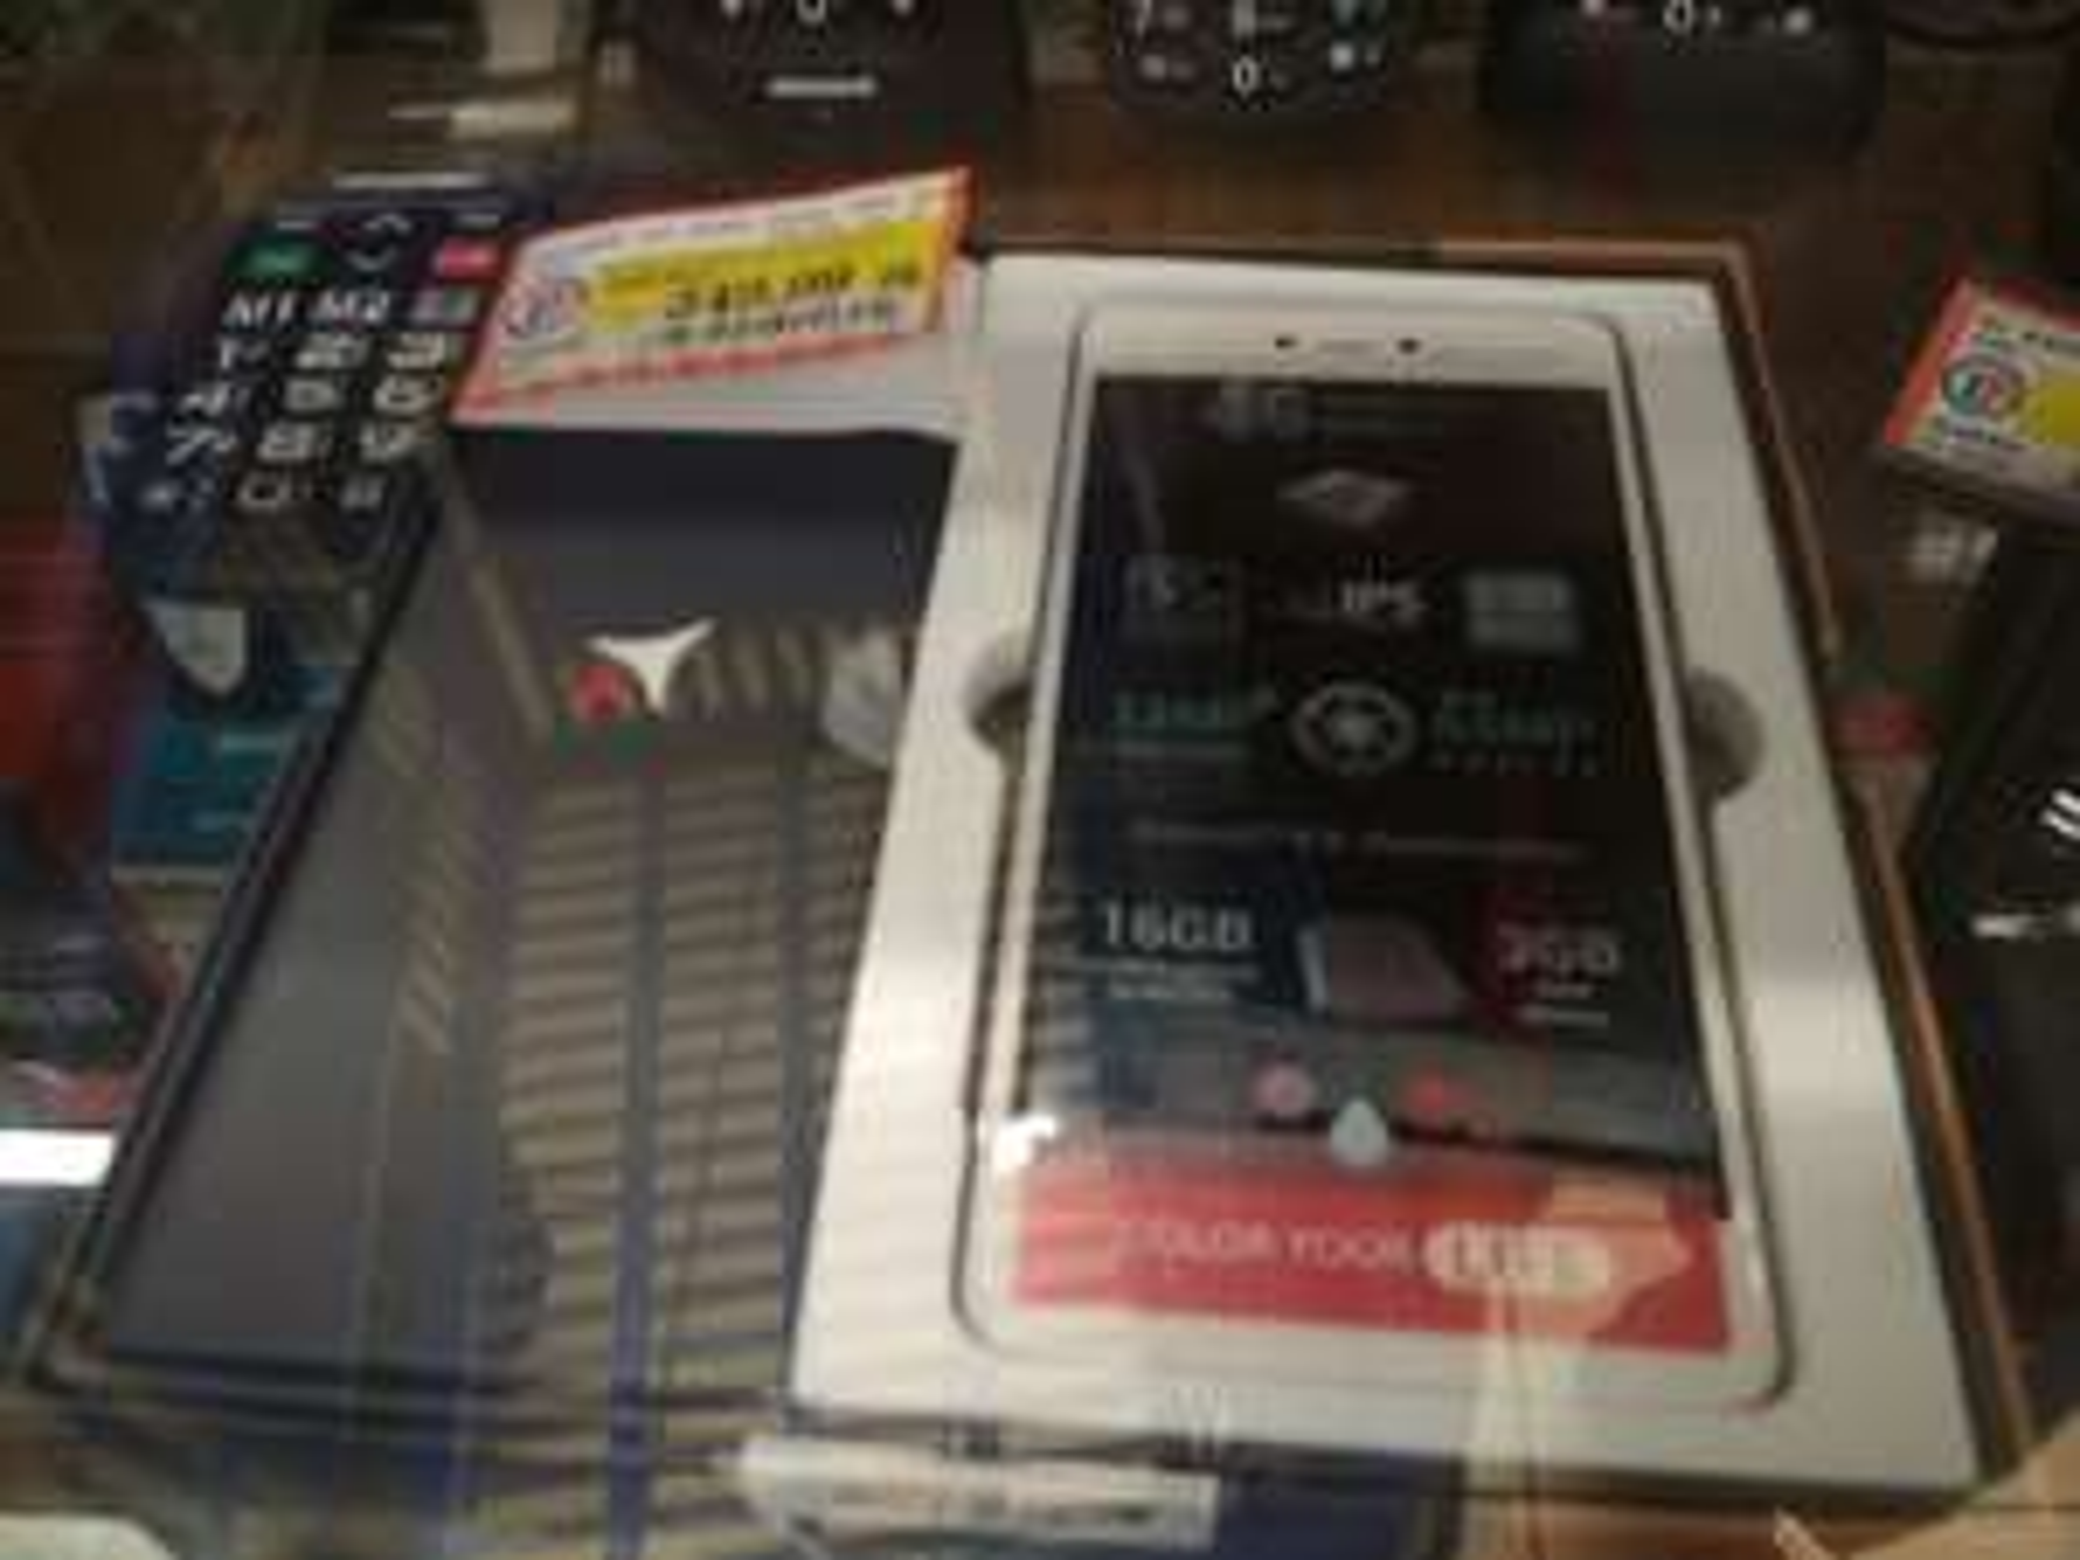 Smartfon 3/16Gb Allview x3 soul lite za 349zl